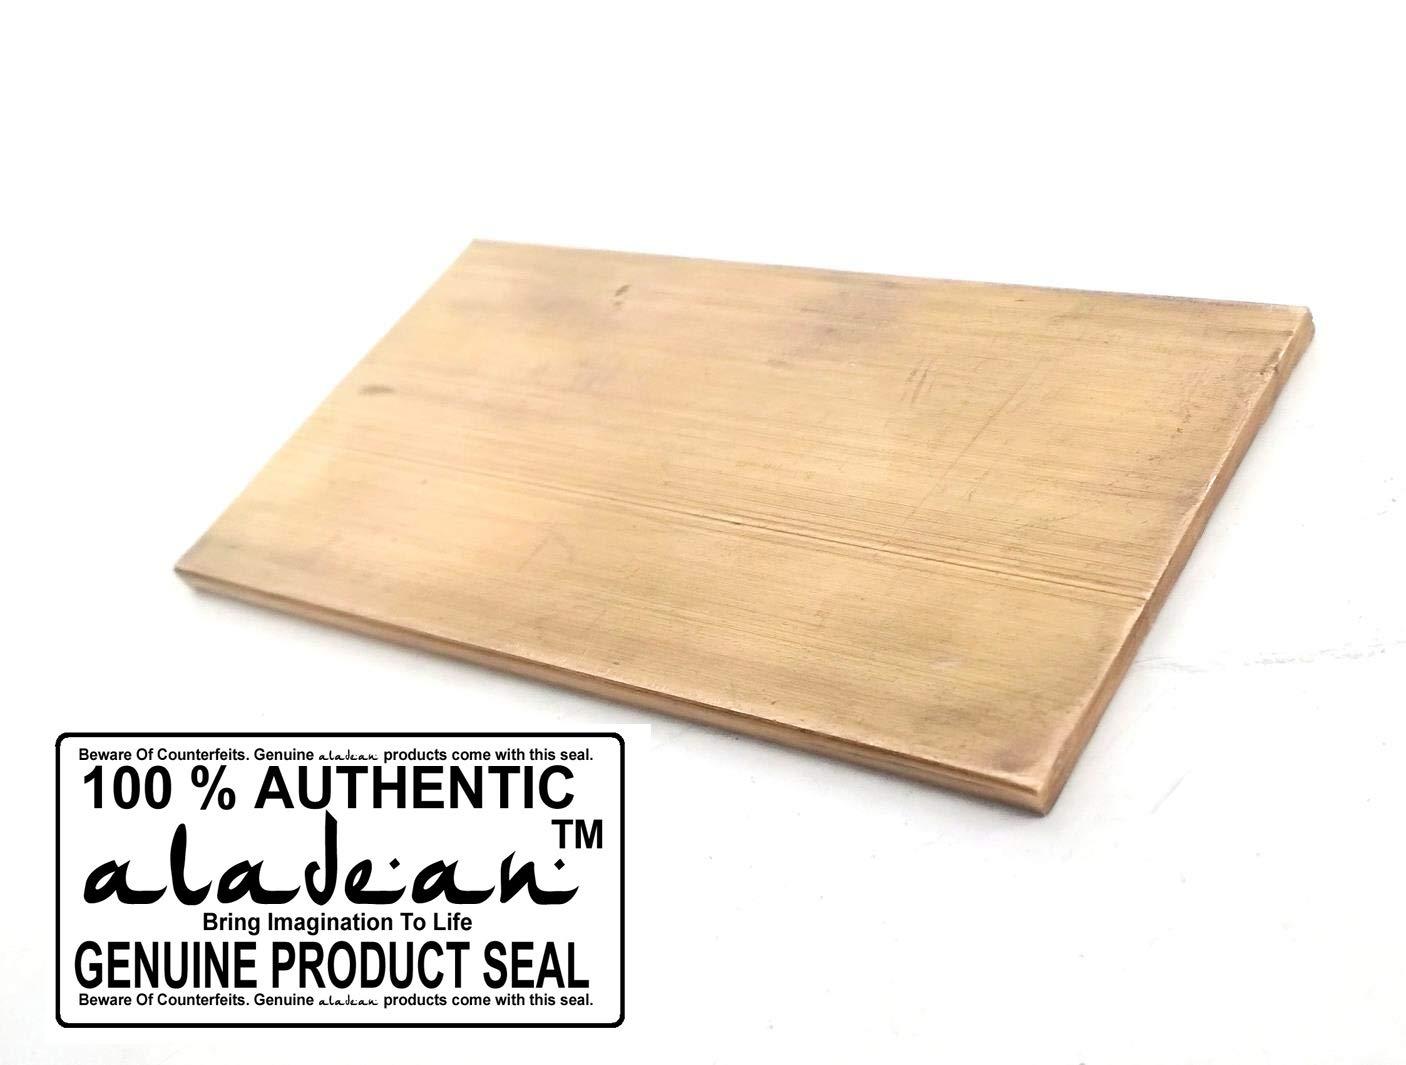 1//4 x 2 Brass Flat BAR 4 Long C360 Solid .25 Plate 6mm Mill Stock H02 Craft DIY milling Lathe